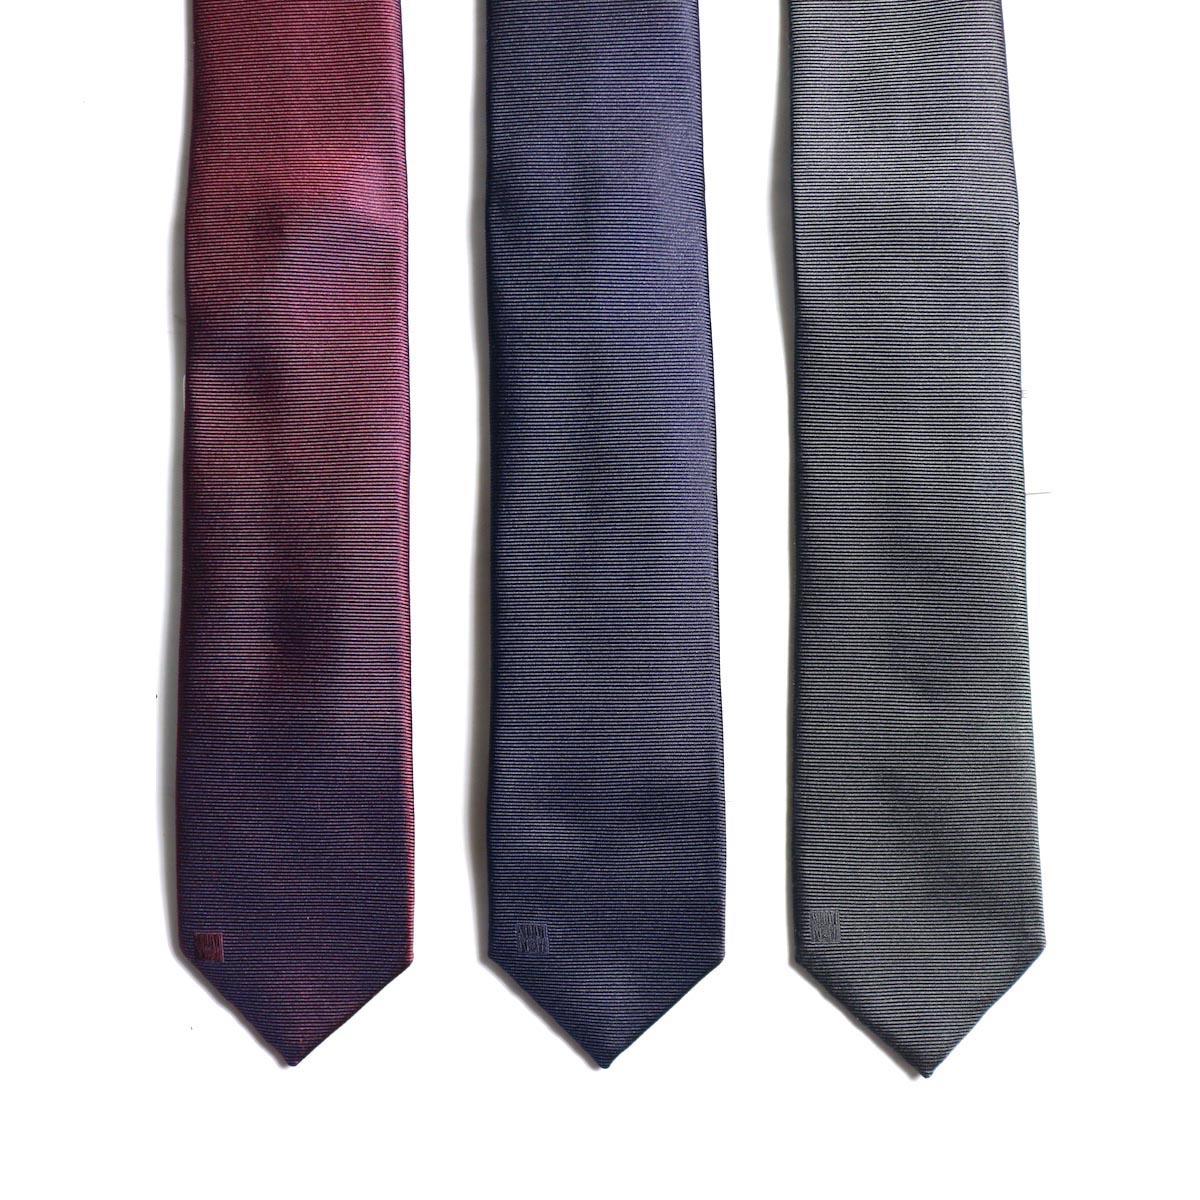 N.HOOLYWOOD / 282-AC02 Narrow Tie